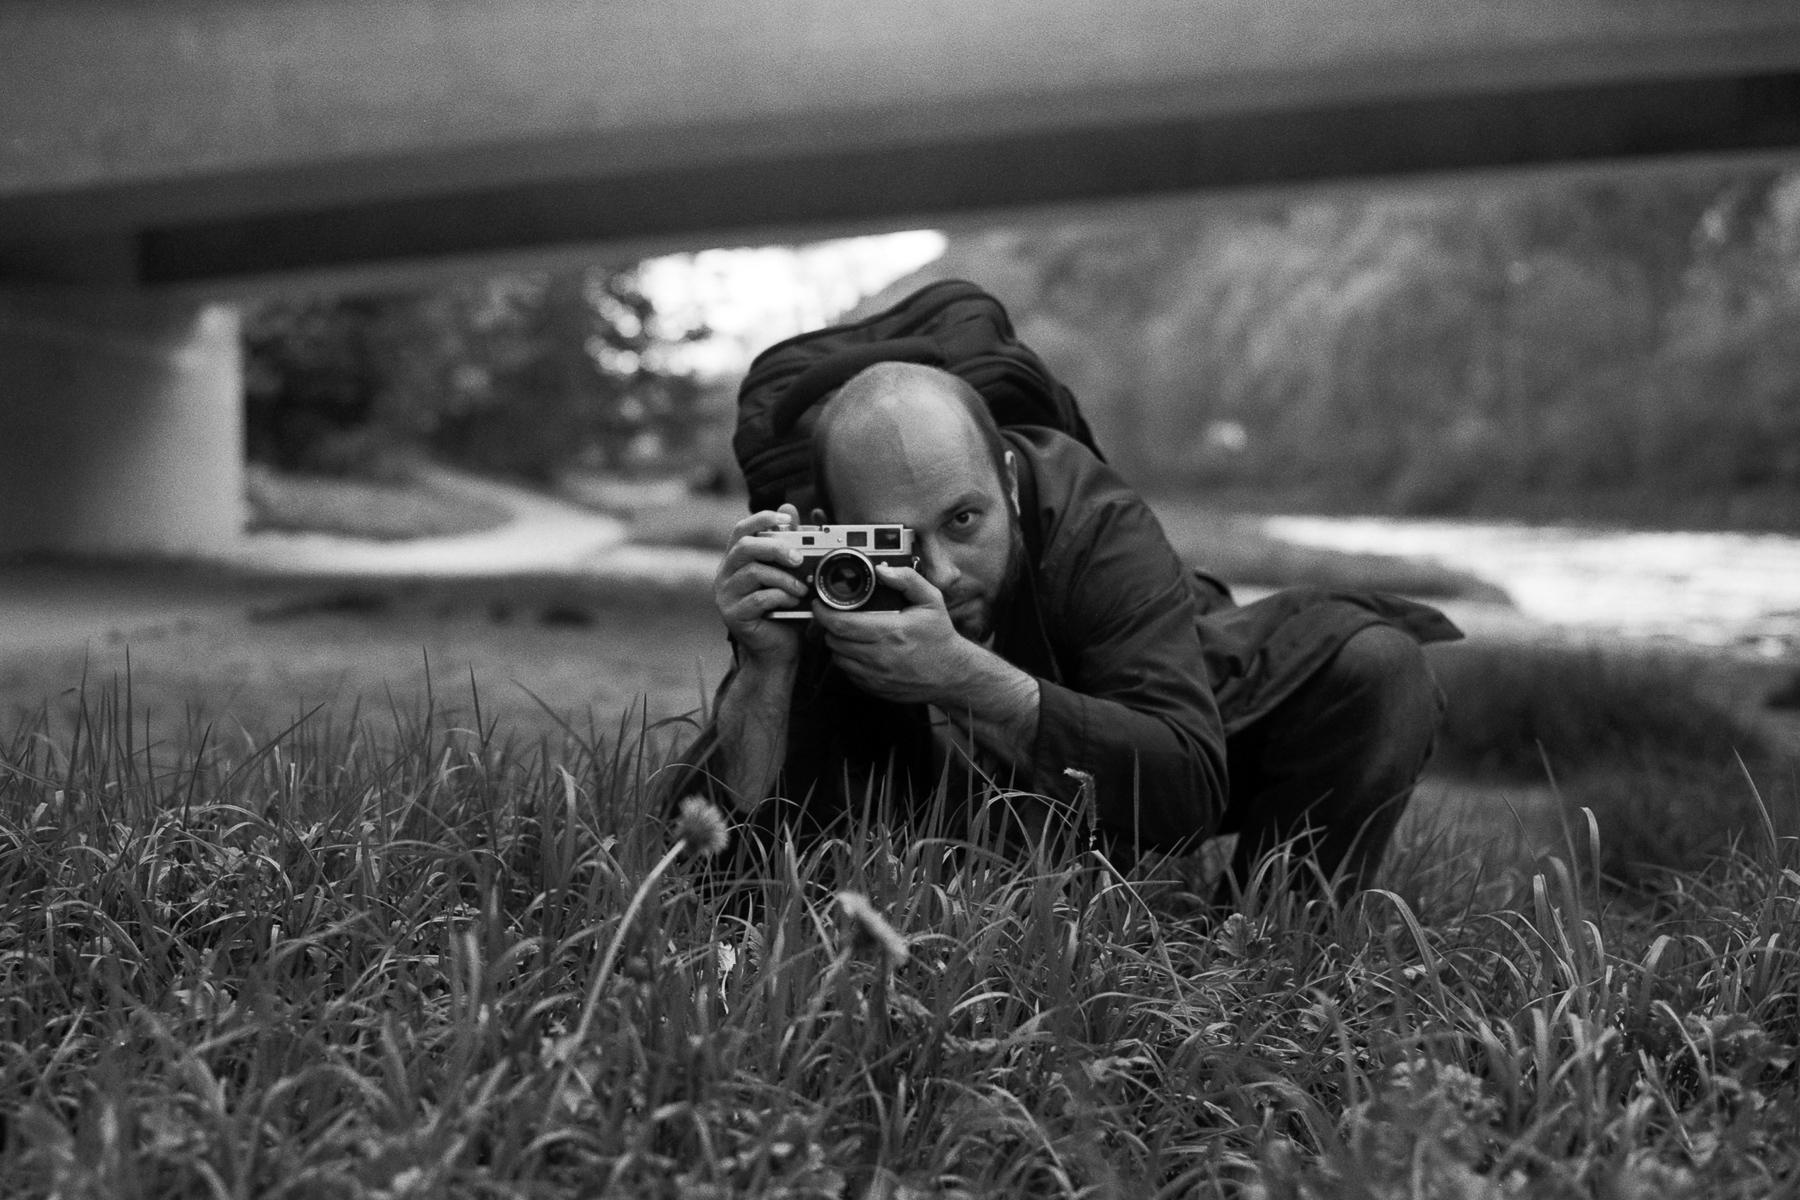 Ramón, Leica M2 , Carl Zeiss Planar 50mm f/2 ZM, Ilford Delta 100, Rodinal 1+50, 20°C, 8 min